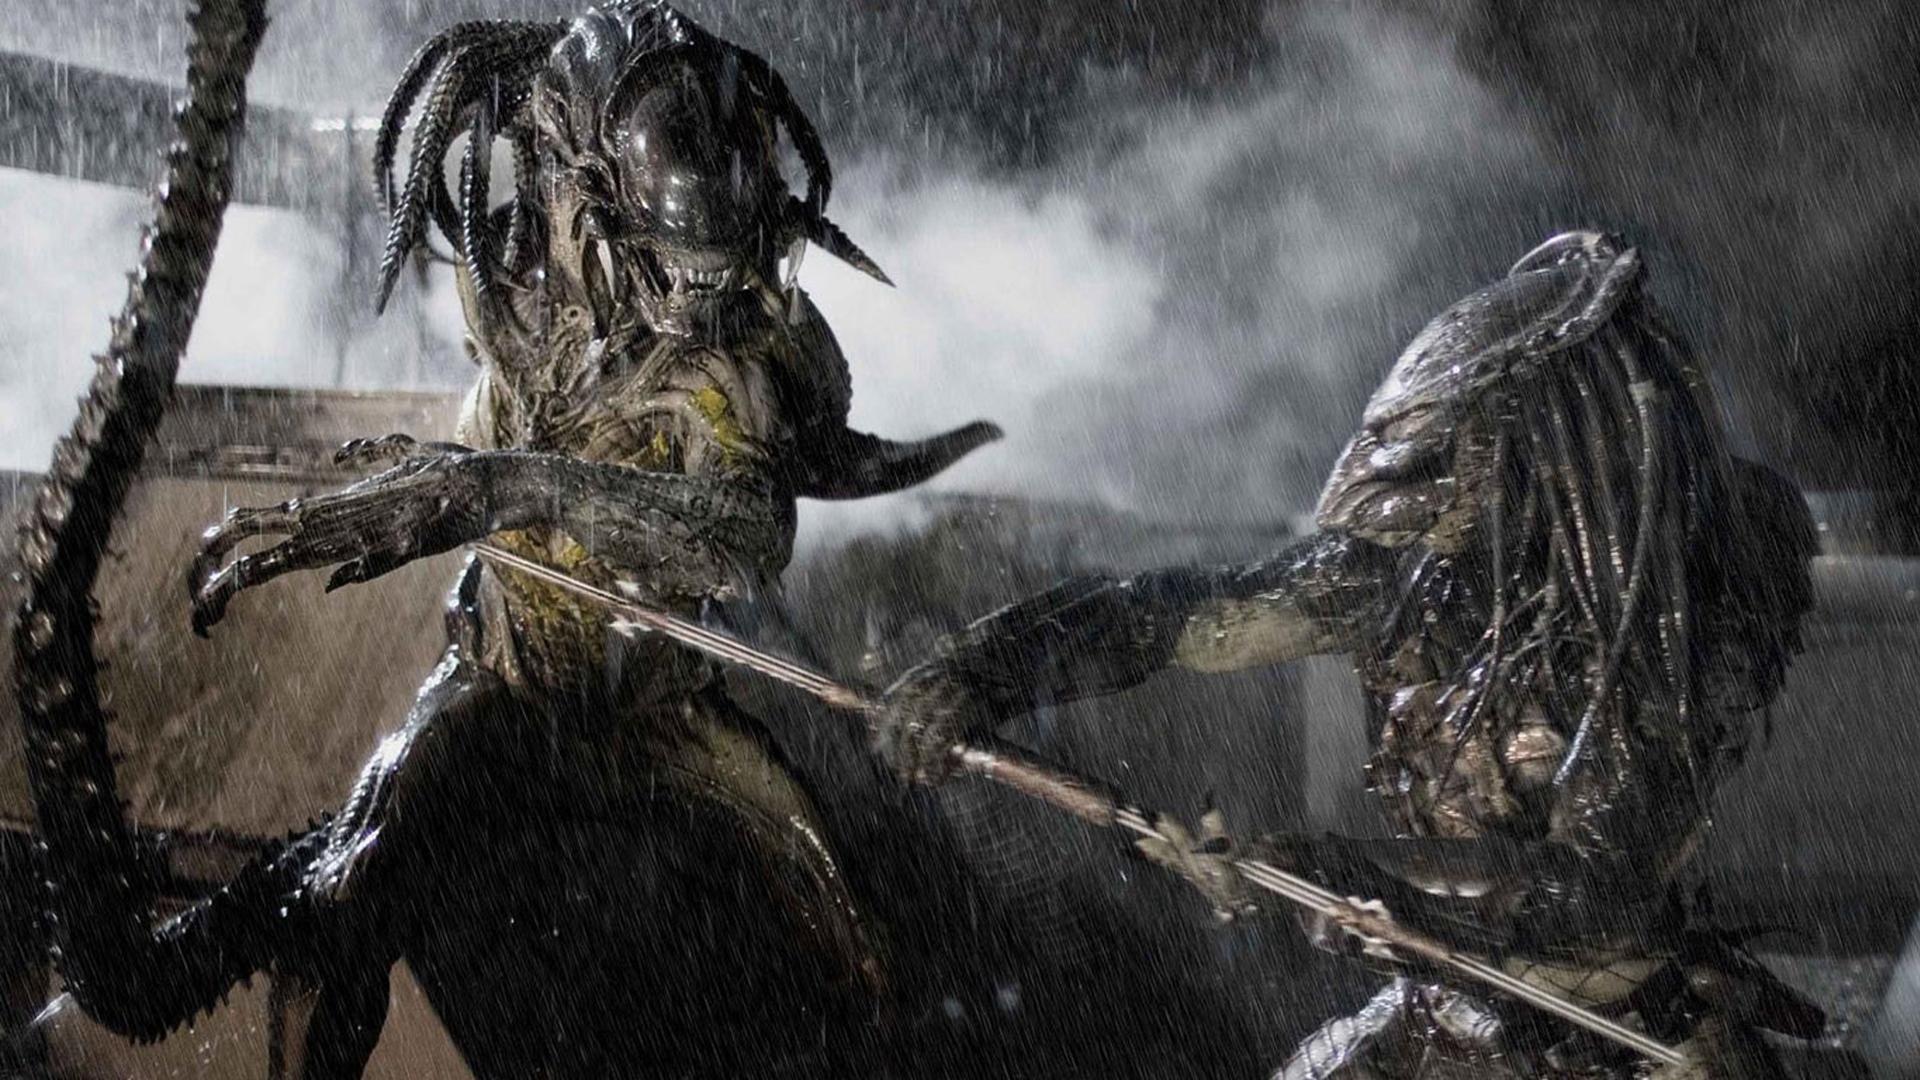 High Definition Wallpapers Hd Wallpapers Aliens Vs Predator Movie